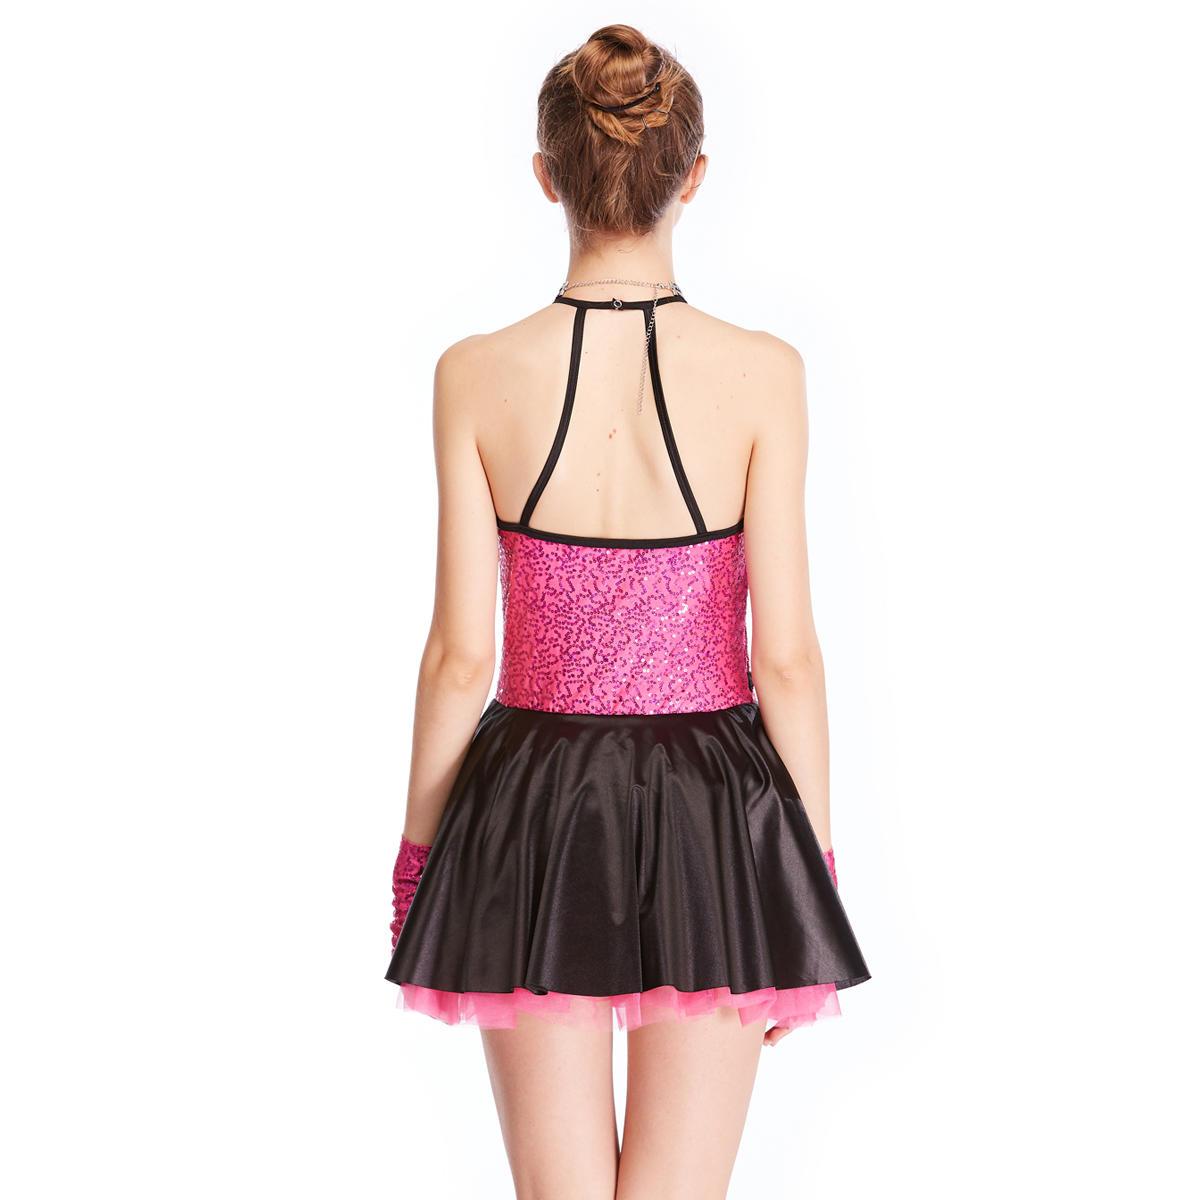 Girls Skirt Dance Dress Jazz And Stage Dance Costumes Jazz Dance Wear